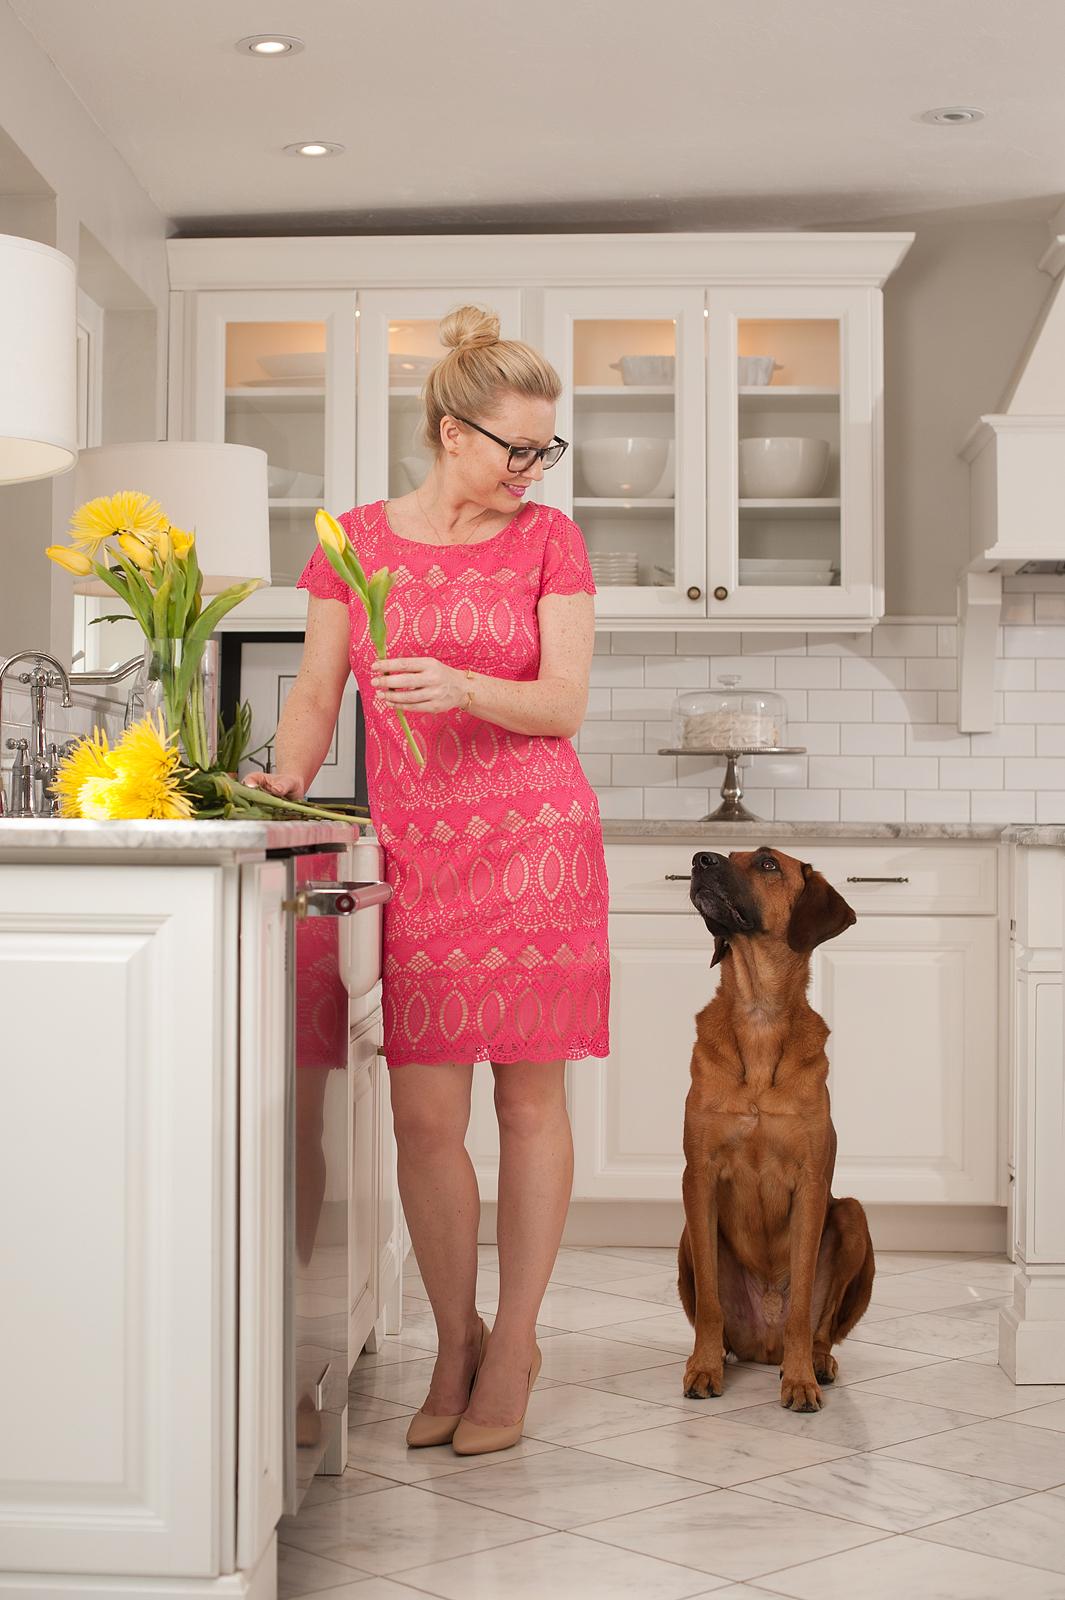 22-designer-flowers-kitchen-loyal-dog-playful-branding.jpg